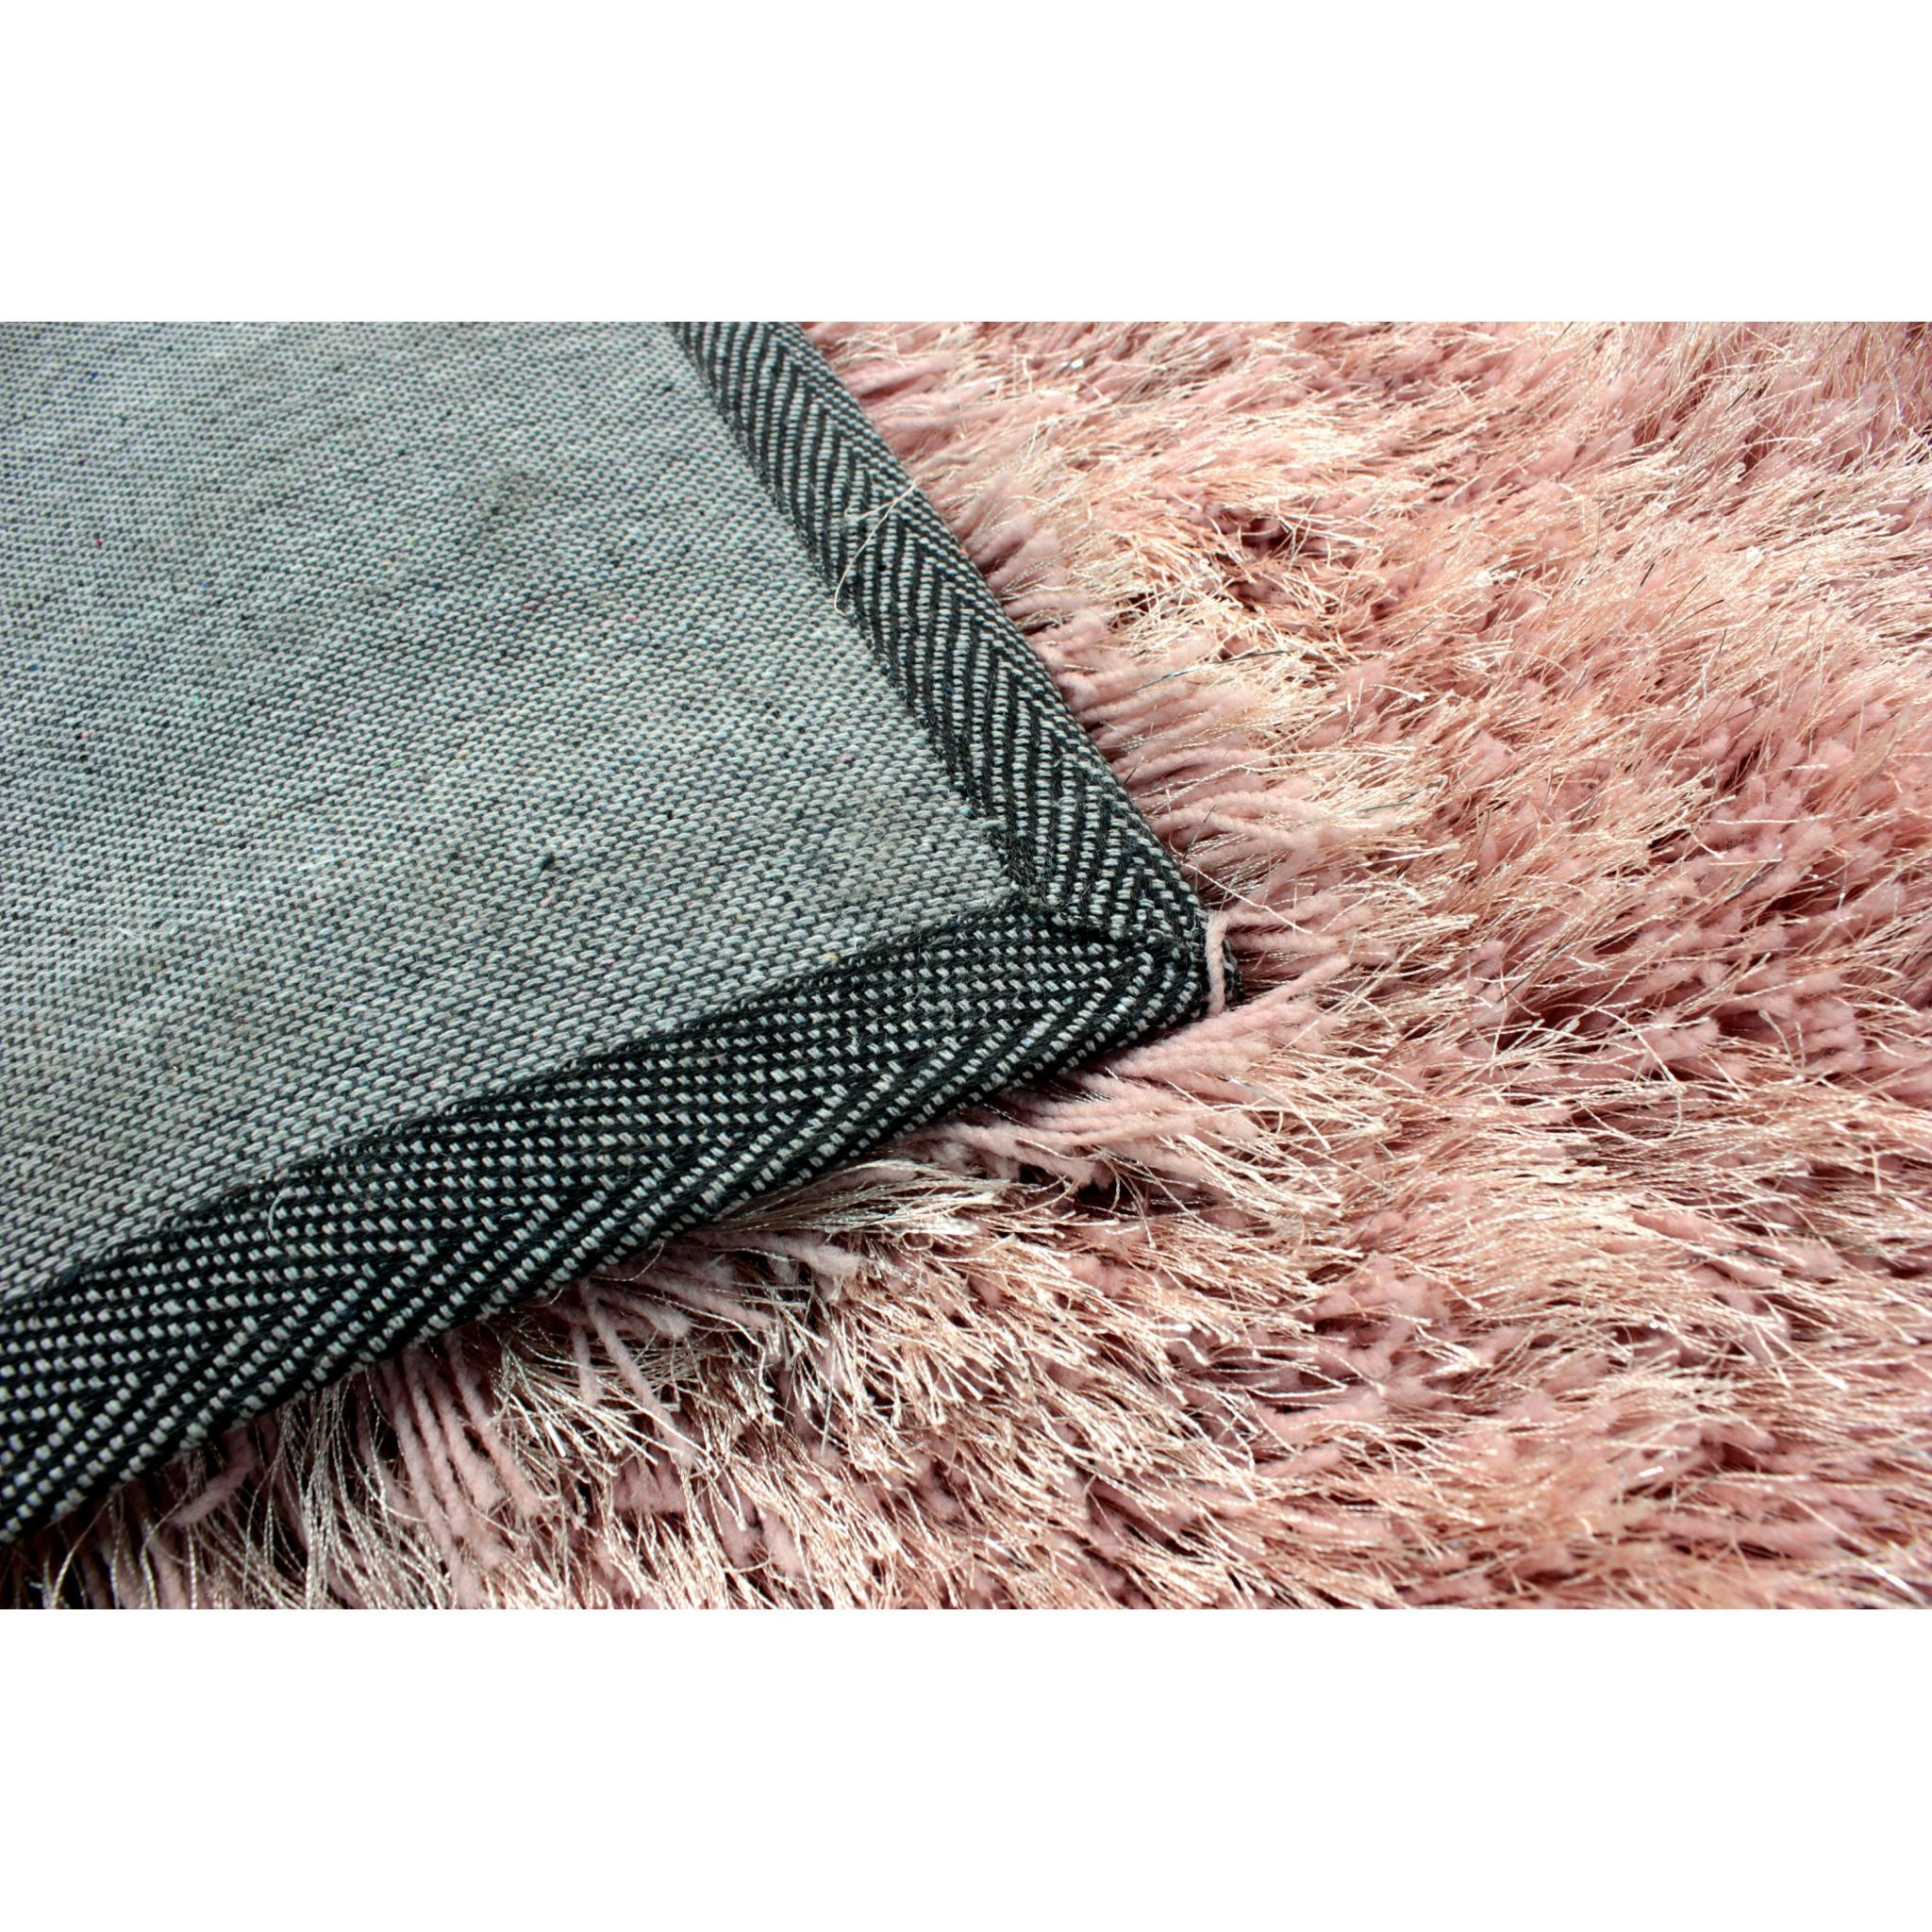 Flair Rugs Dazzle Blush Pink Plain Shaggy Sparkle Rug - 160 x 230 cm